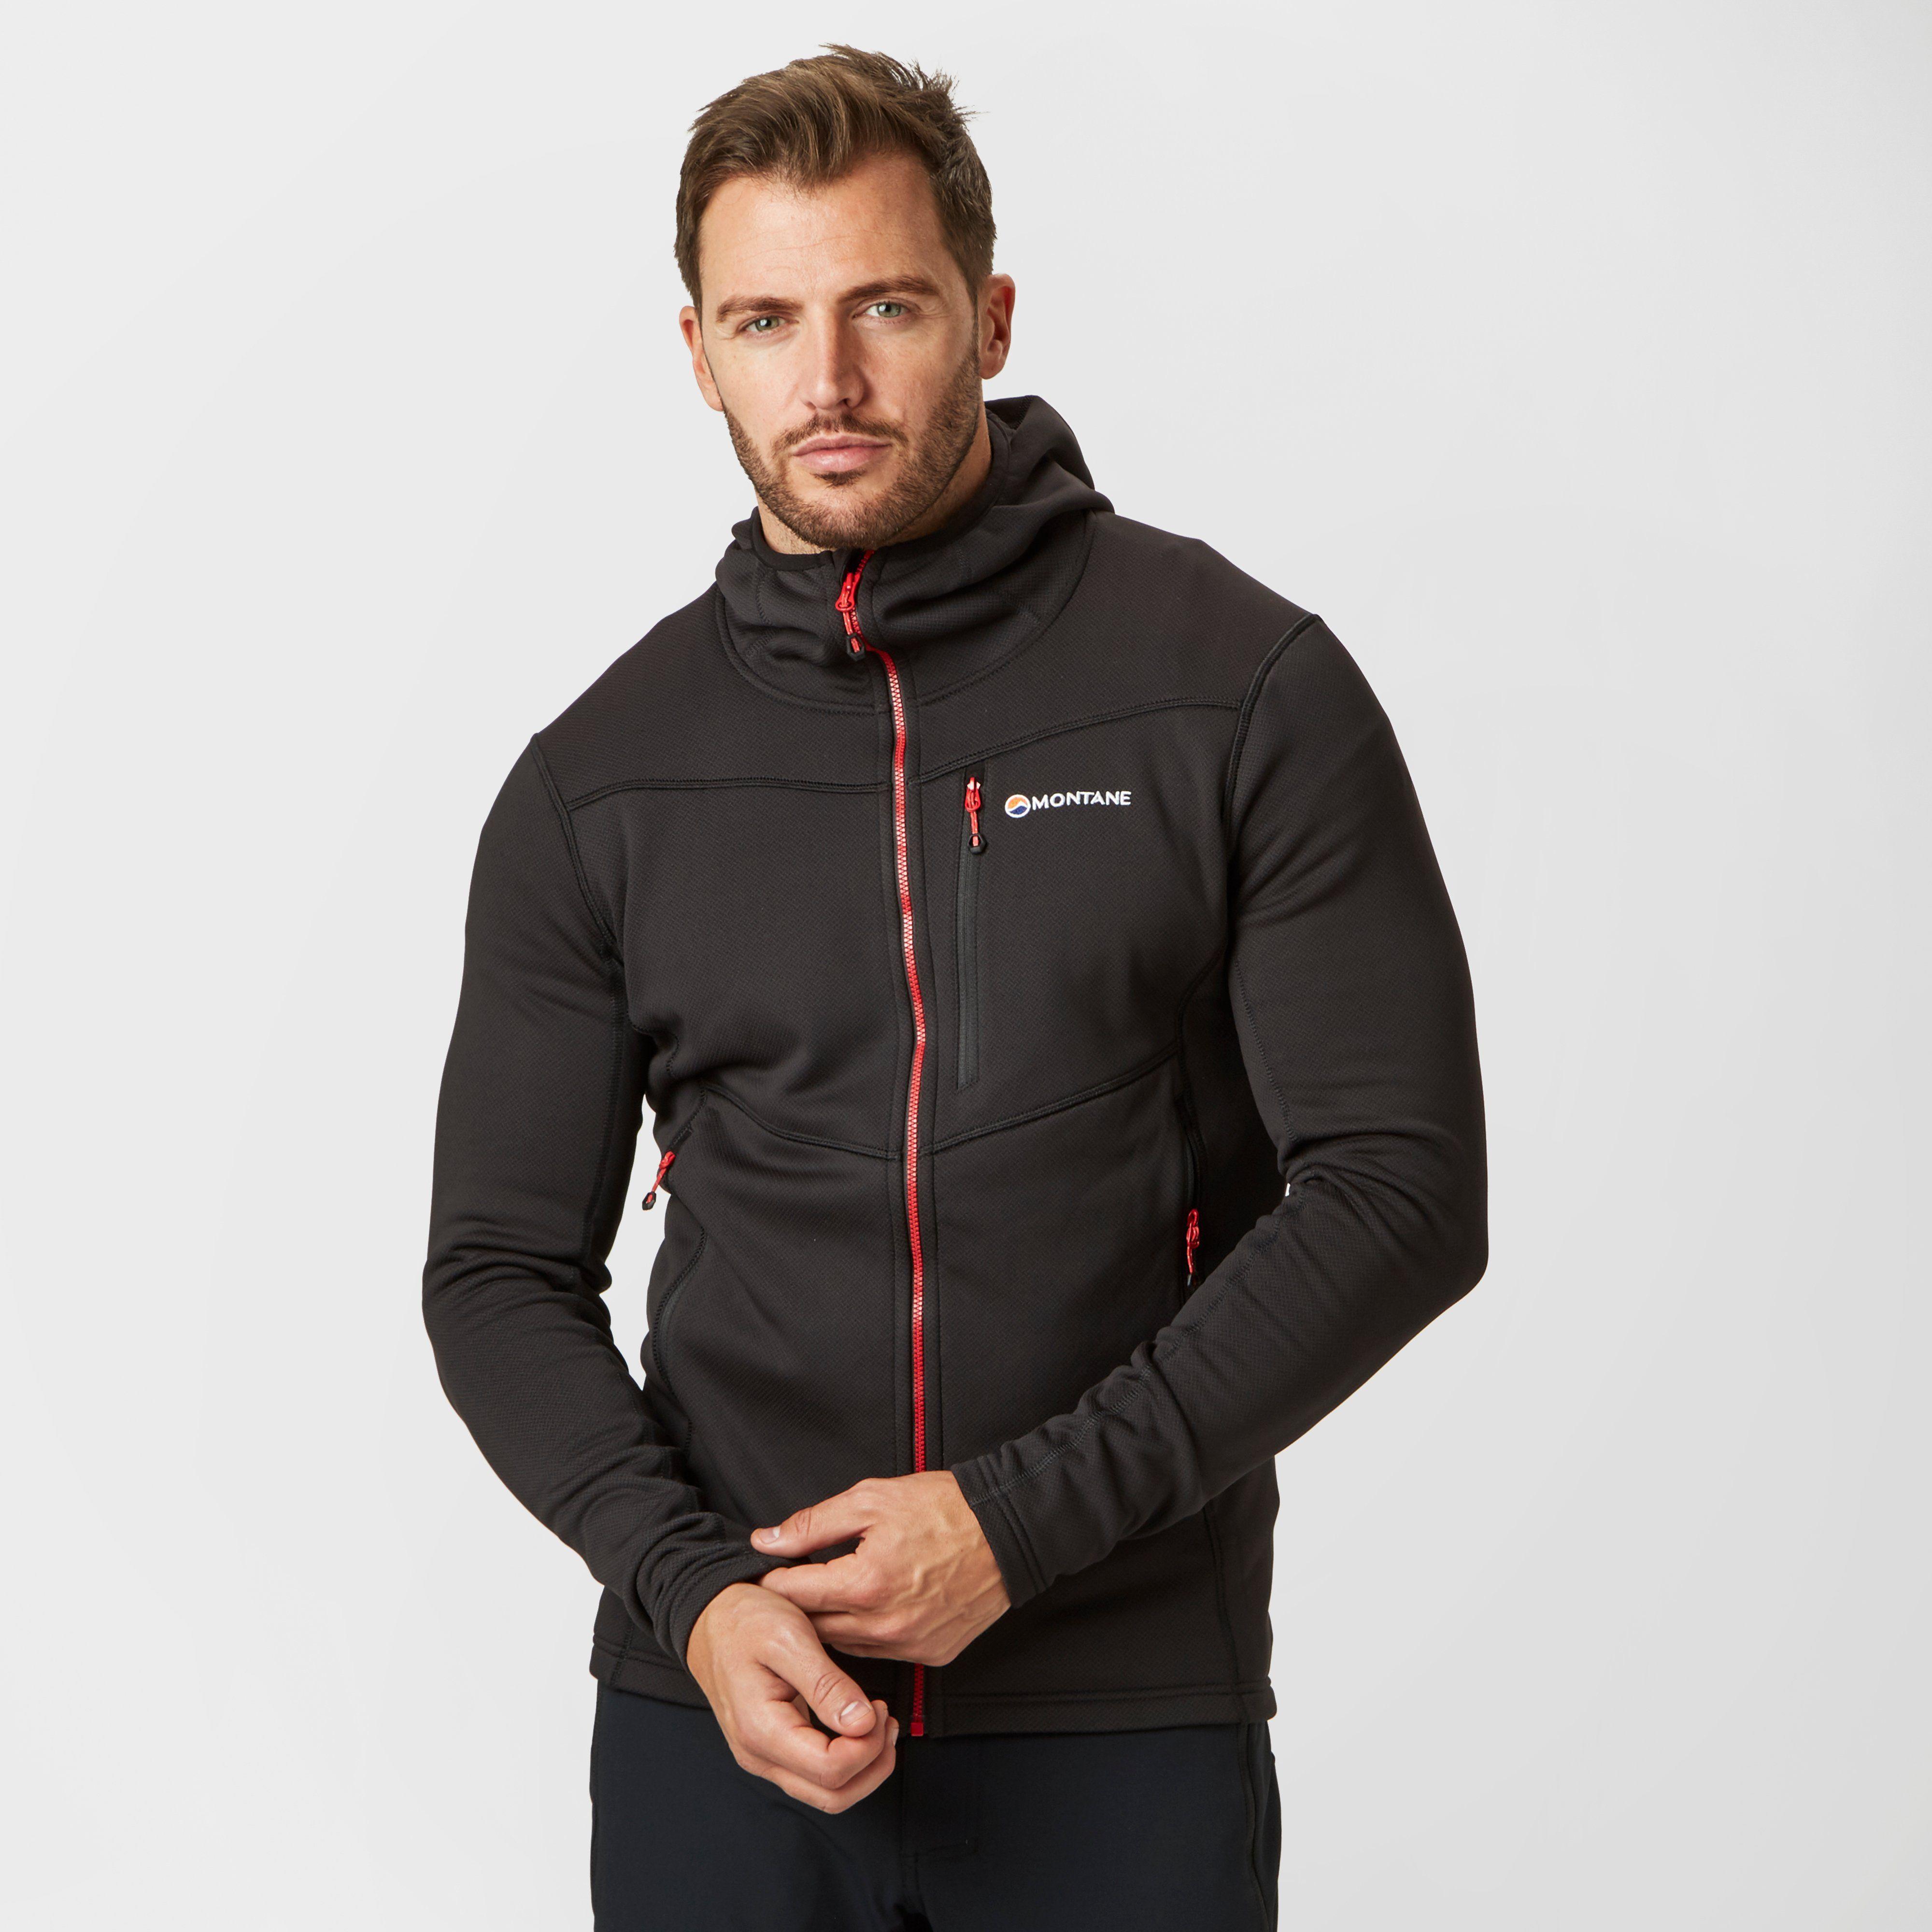 MONTANE Men's Iridium Softshell Jacket